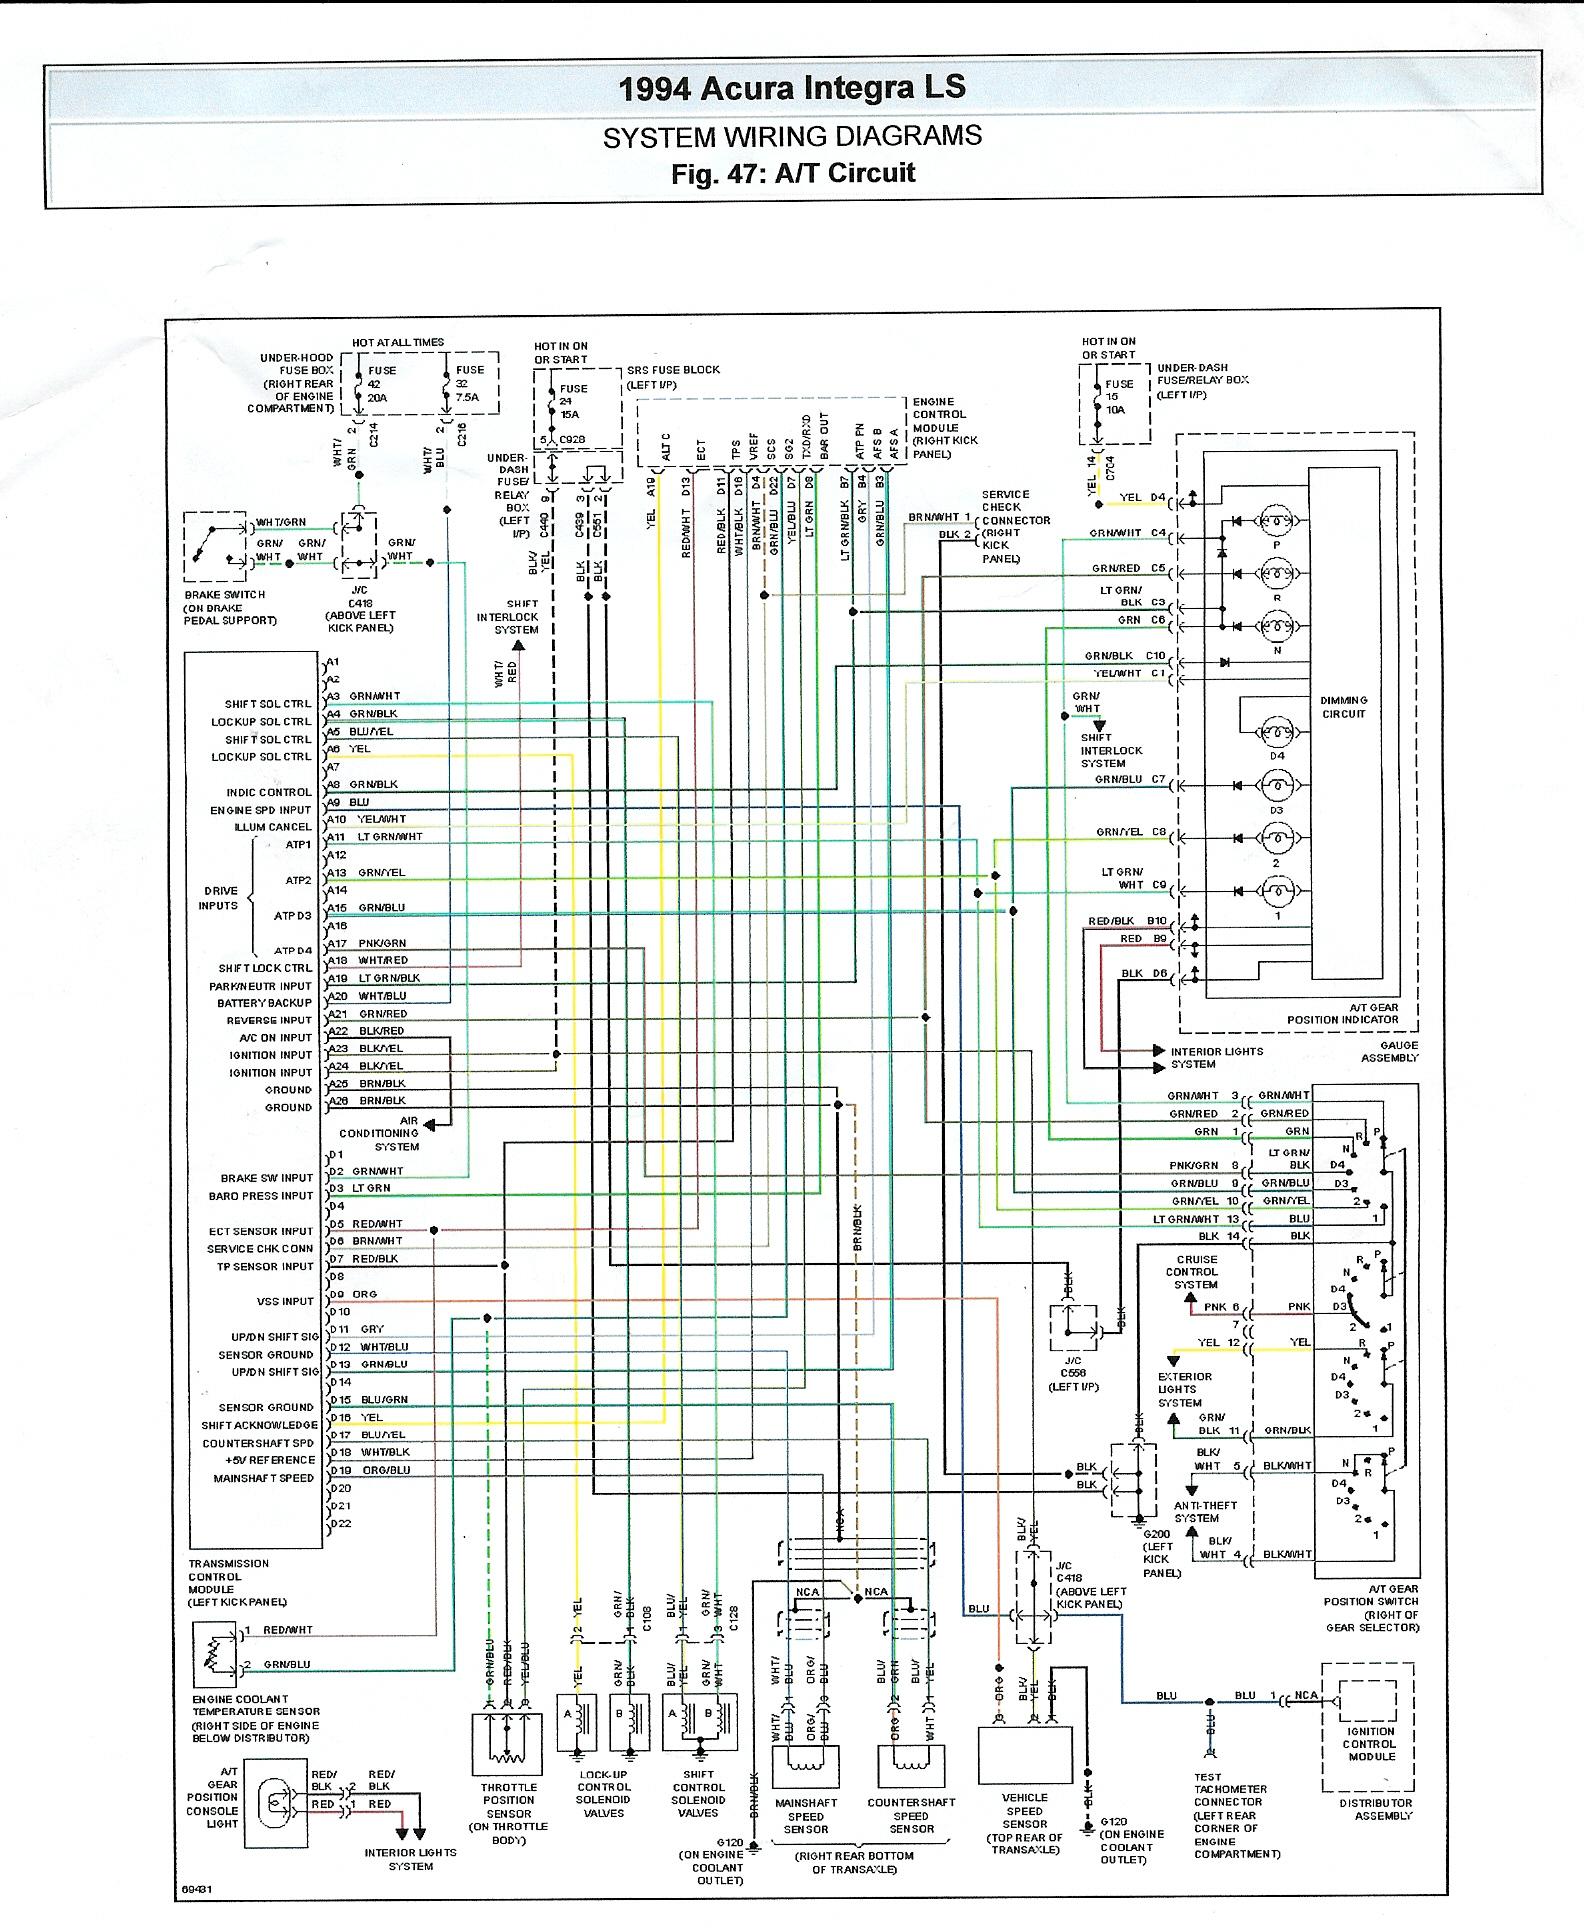 Acura Integra 92 Wiring Diagram - Wiring Diagrams SchematicAsnières Espaces Verts